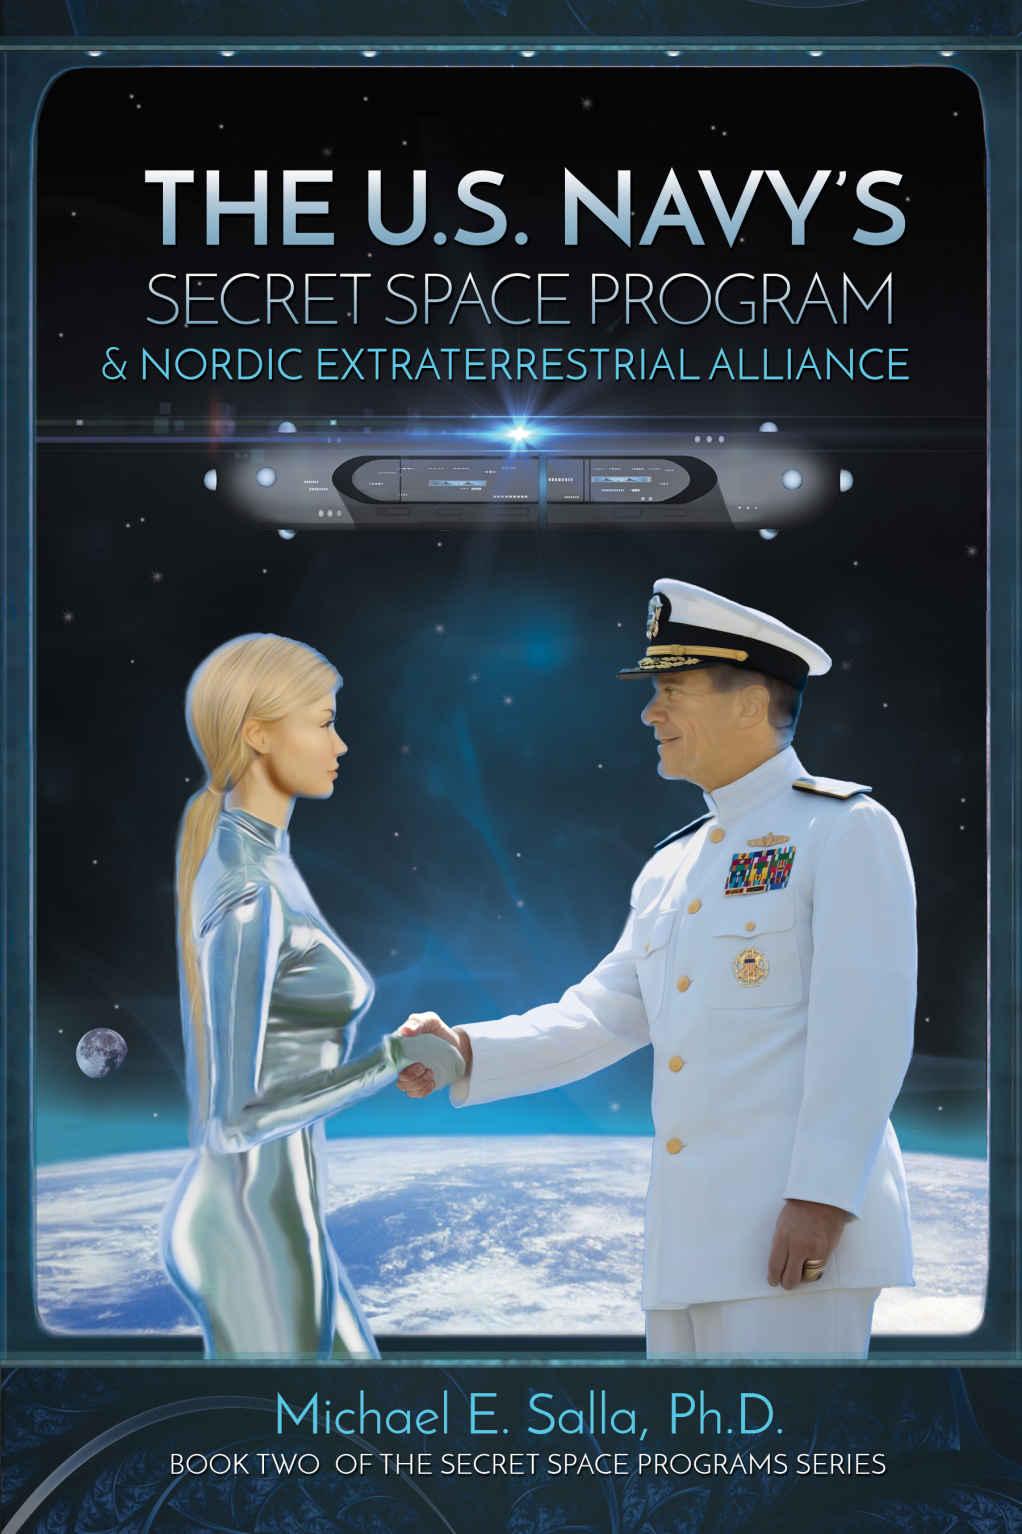 Popular Historical Naval Fiction Books